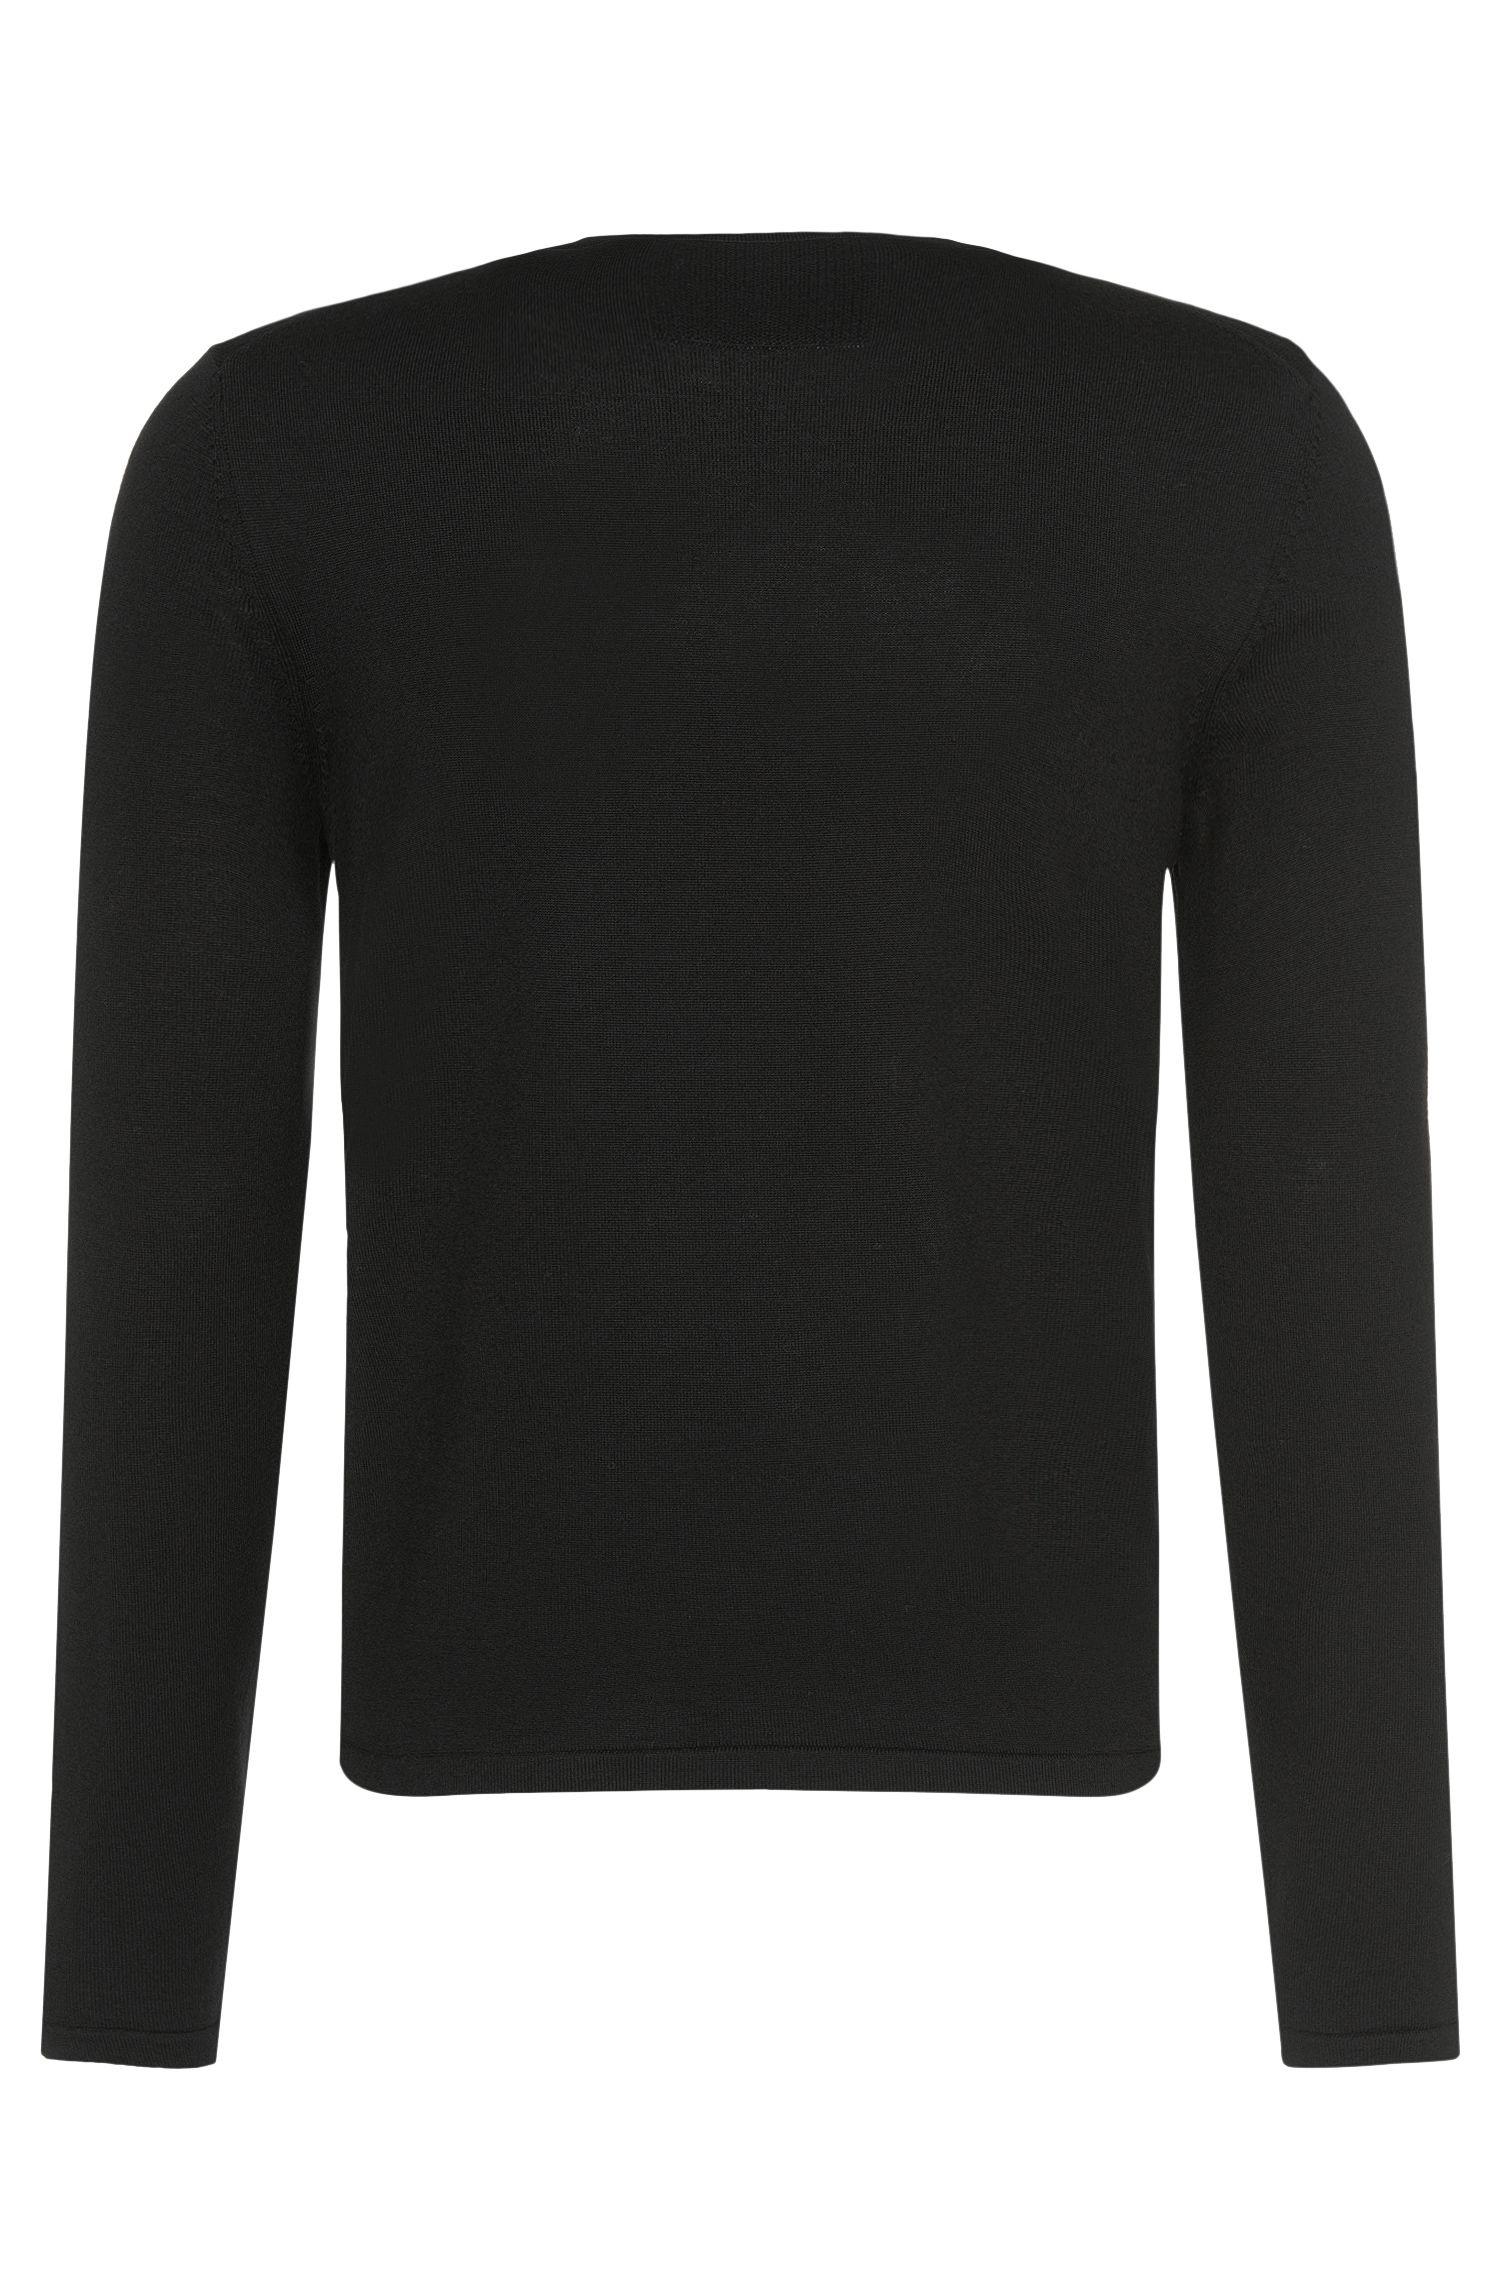 Unifarbener Pullover aus Schurwolle: 'San Paolo'